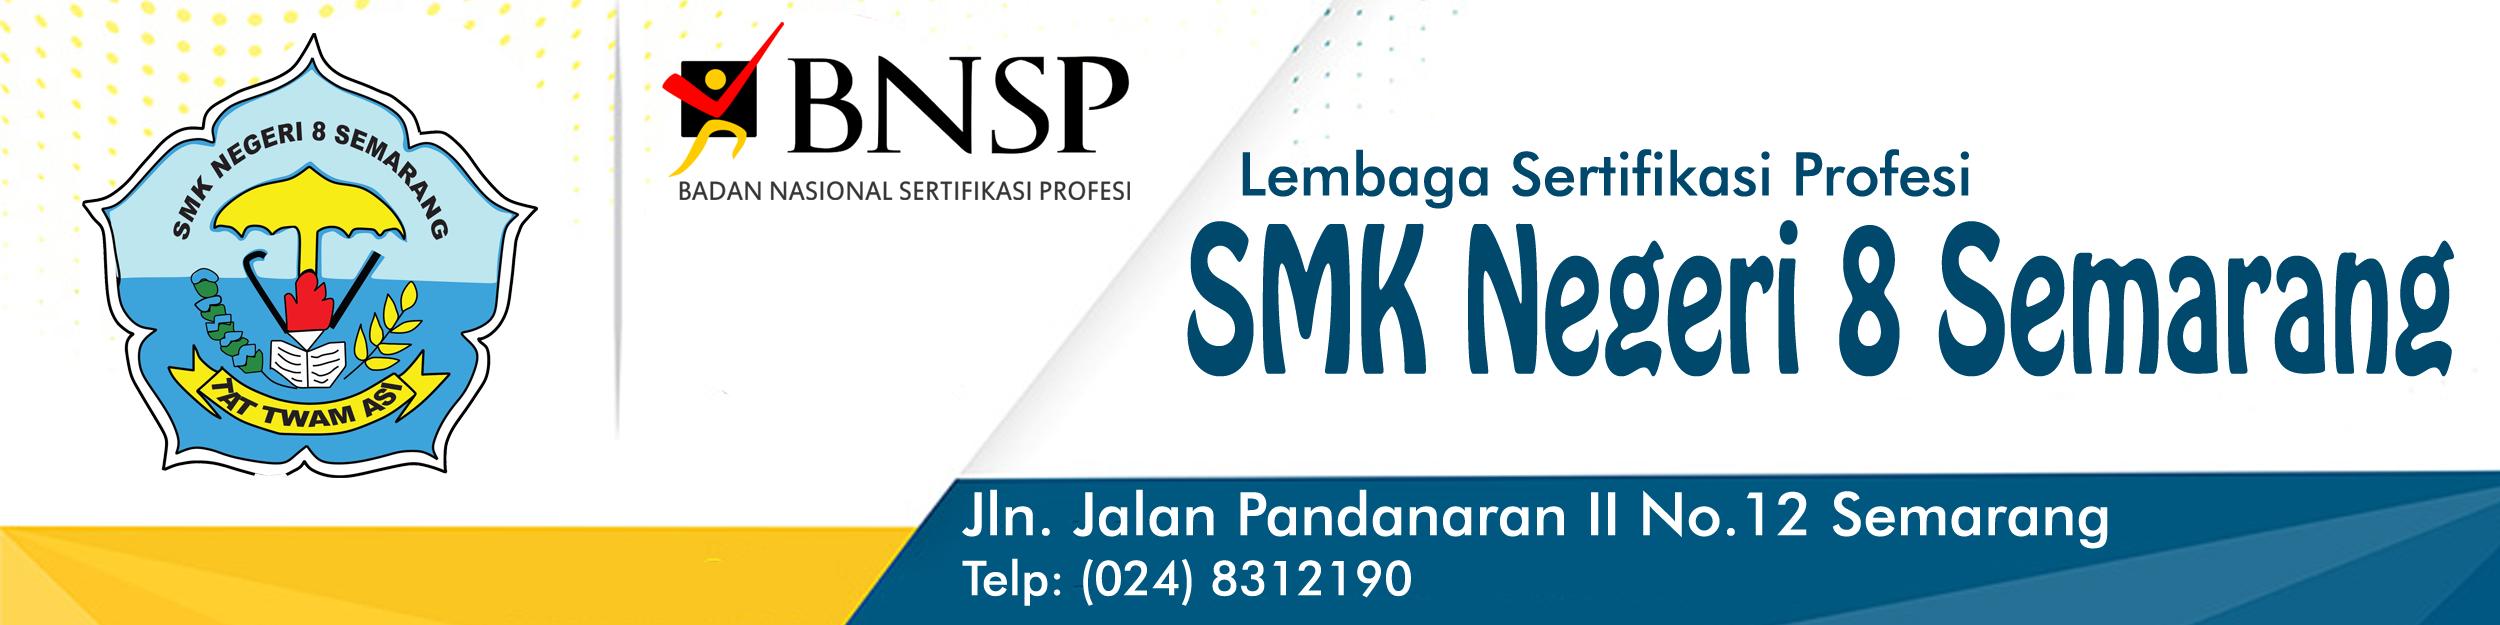 LSP SMKN 8 Semarang